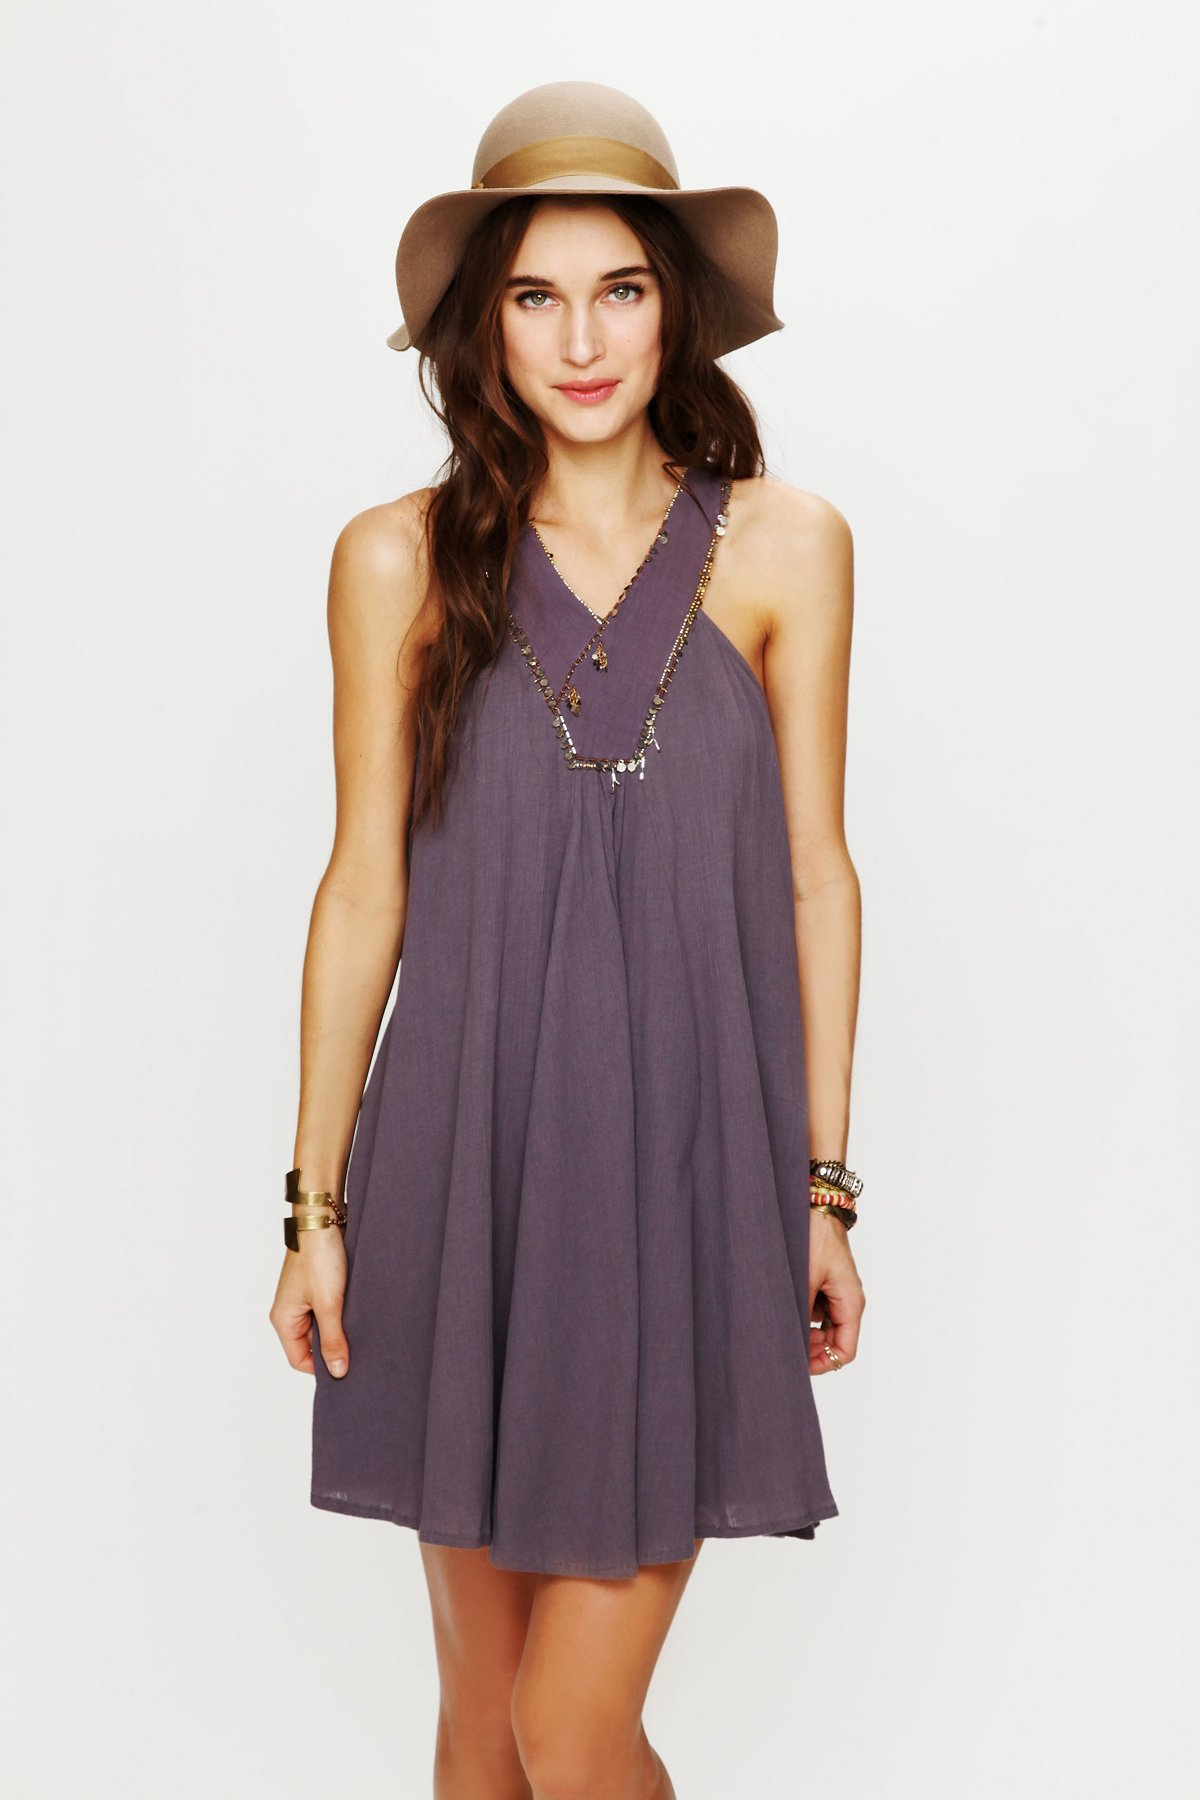 FP ONE Twiggy Embellished Dress